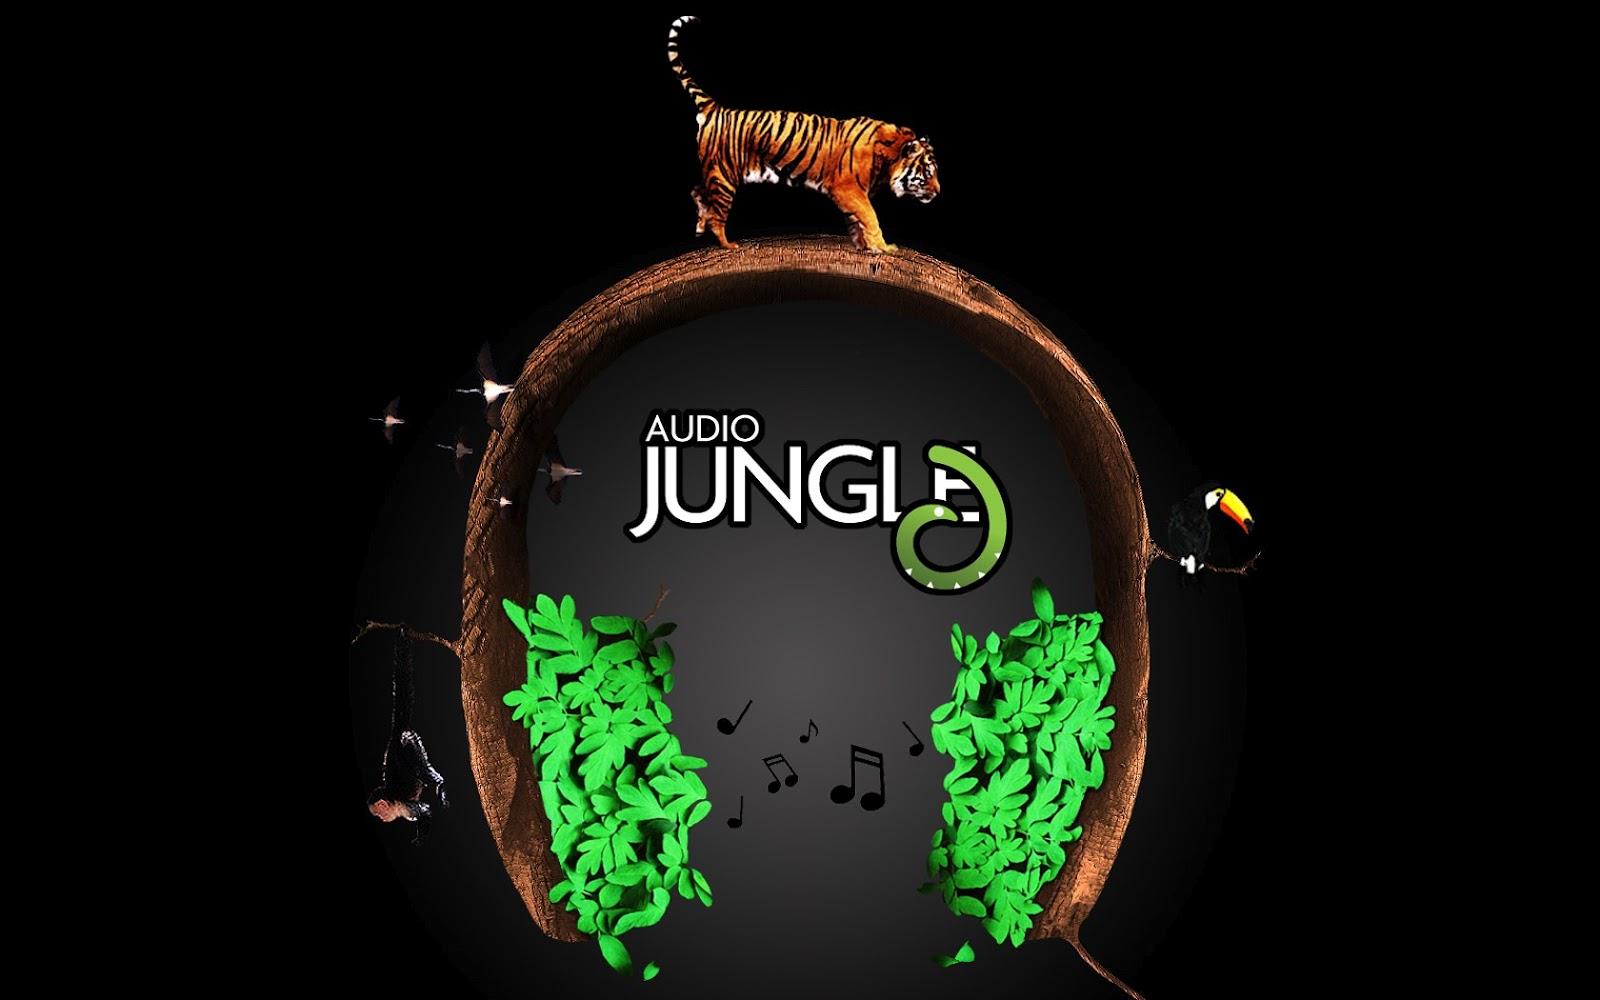 http://3.bp.blogspot.com/-TRQphVESMKU/UE-exHEgq6I/AAAAAAAAB9U/zEj5FL-HSaE/s1600/Jungle-Headphones.jpg